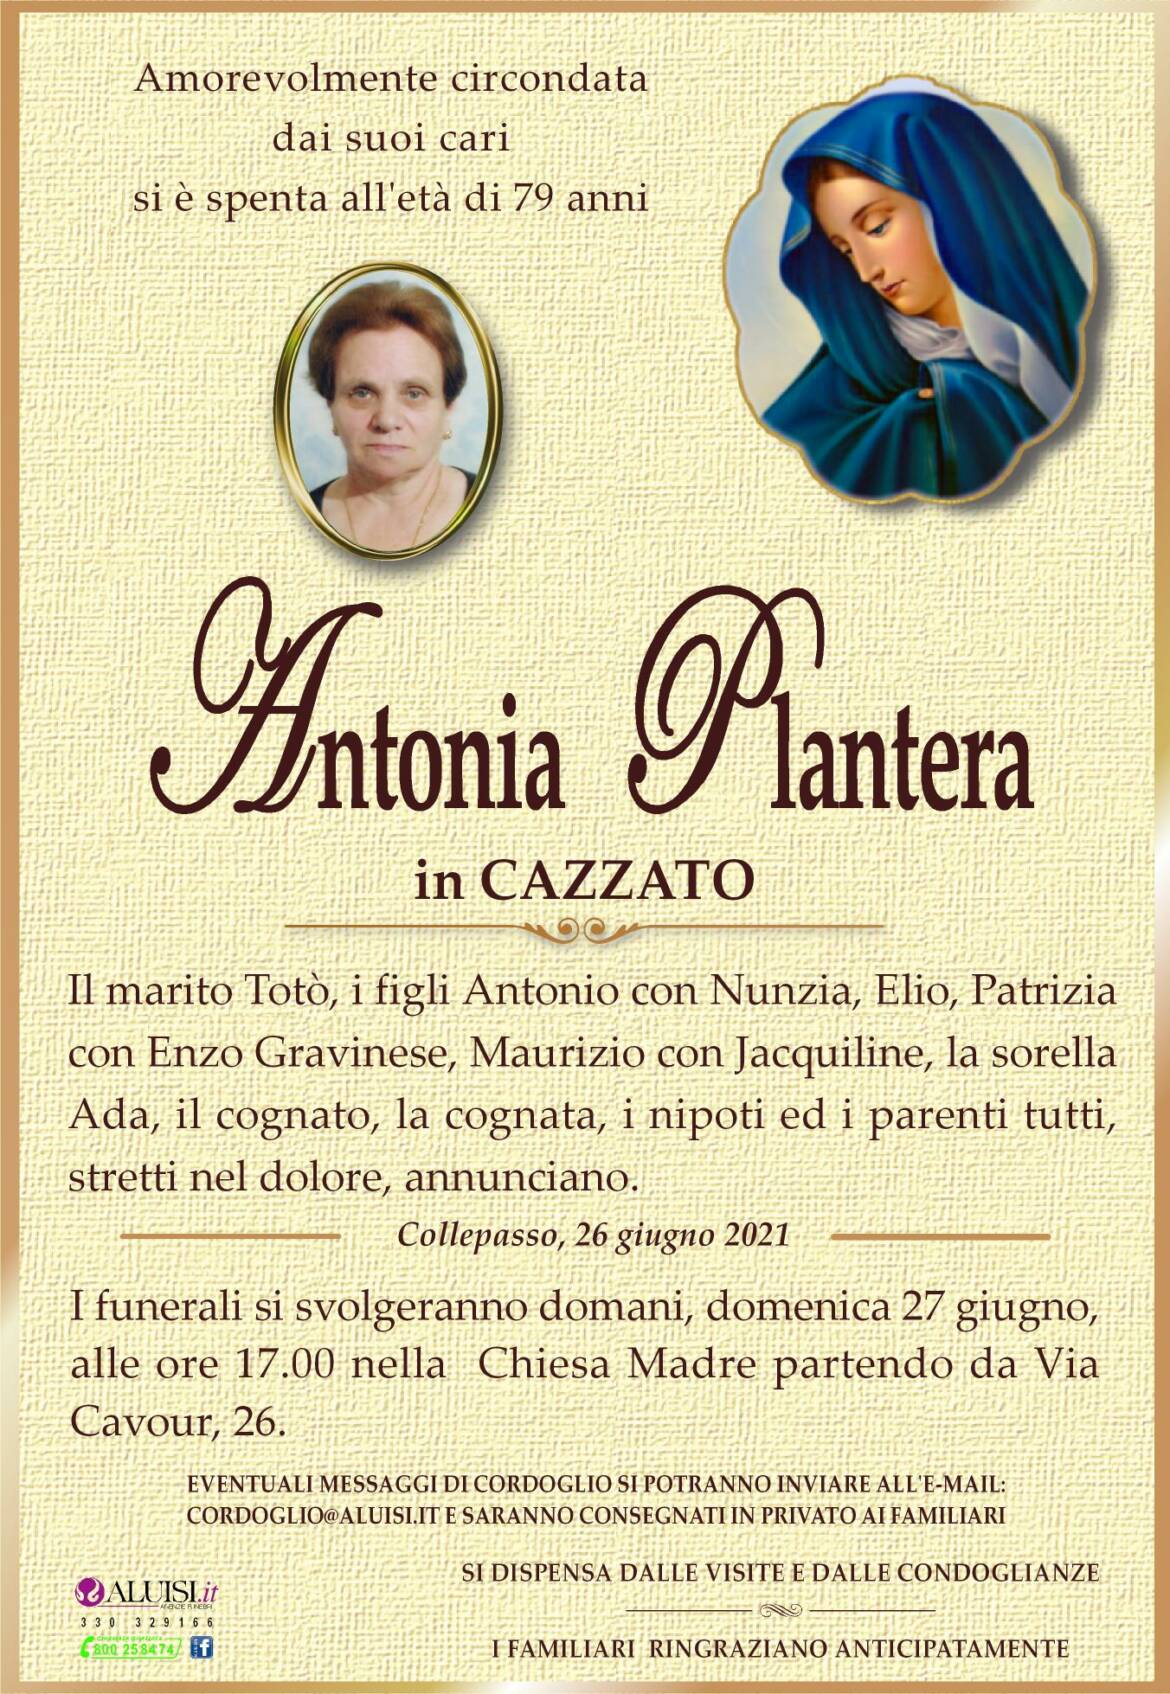 Annuncio-Antonia-Plantera-Cazzato-Elio-1.jpg